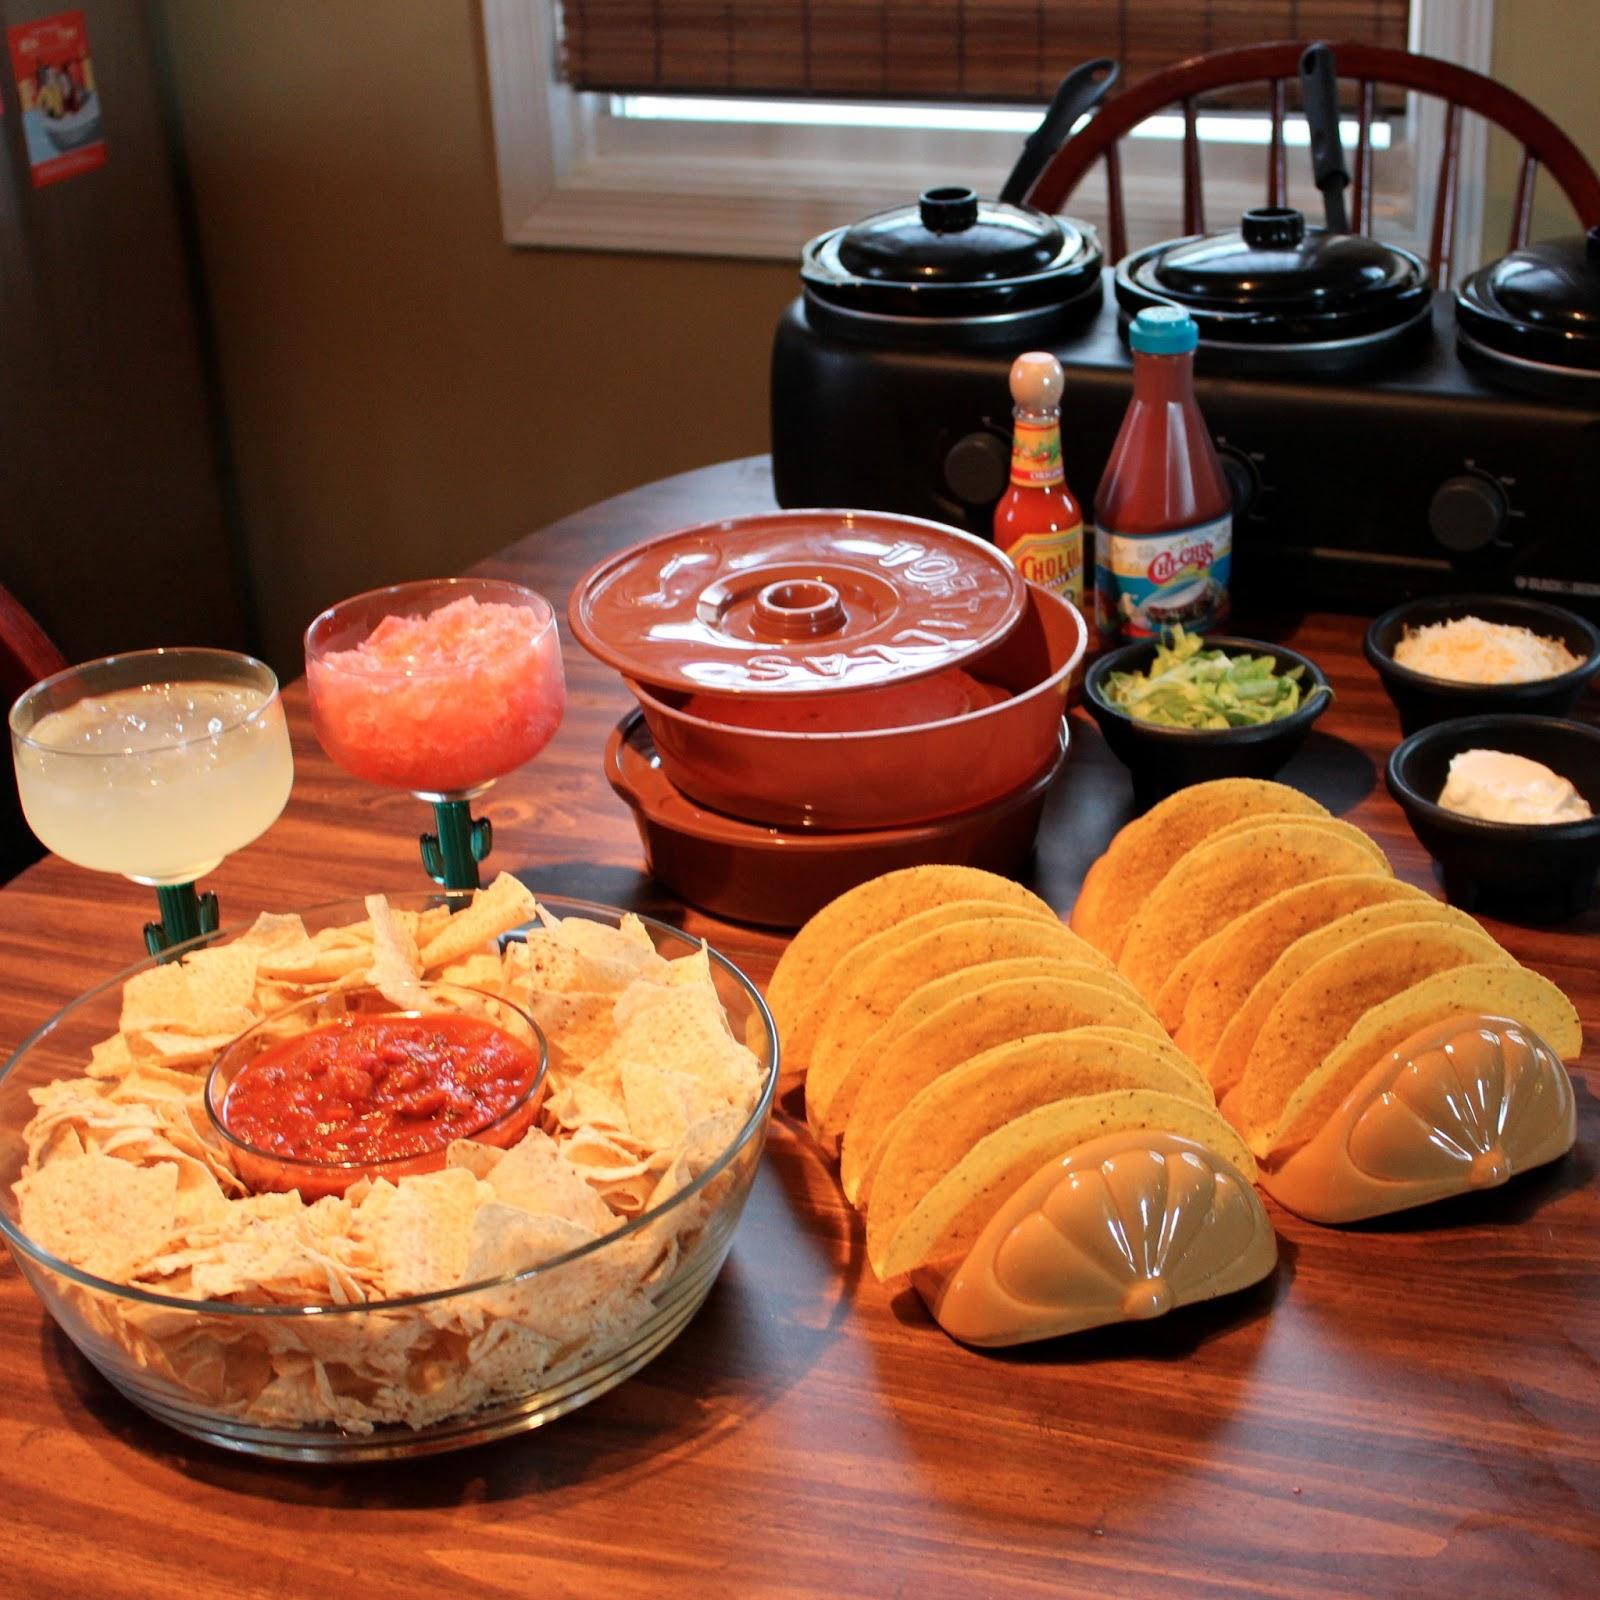 cinco de mayo fiesta at home taco night ideas dana renee style